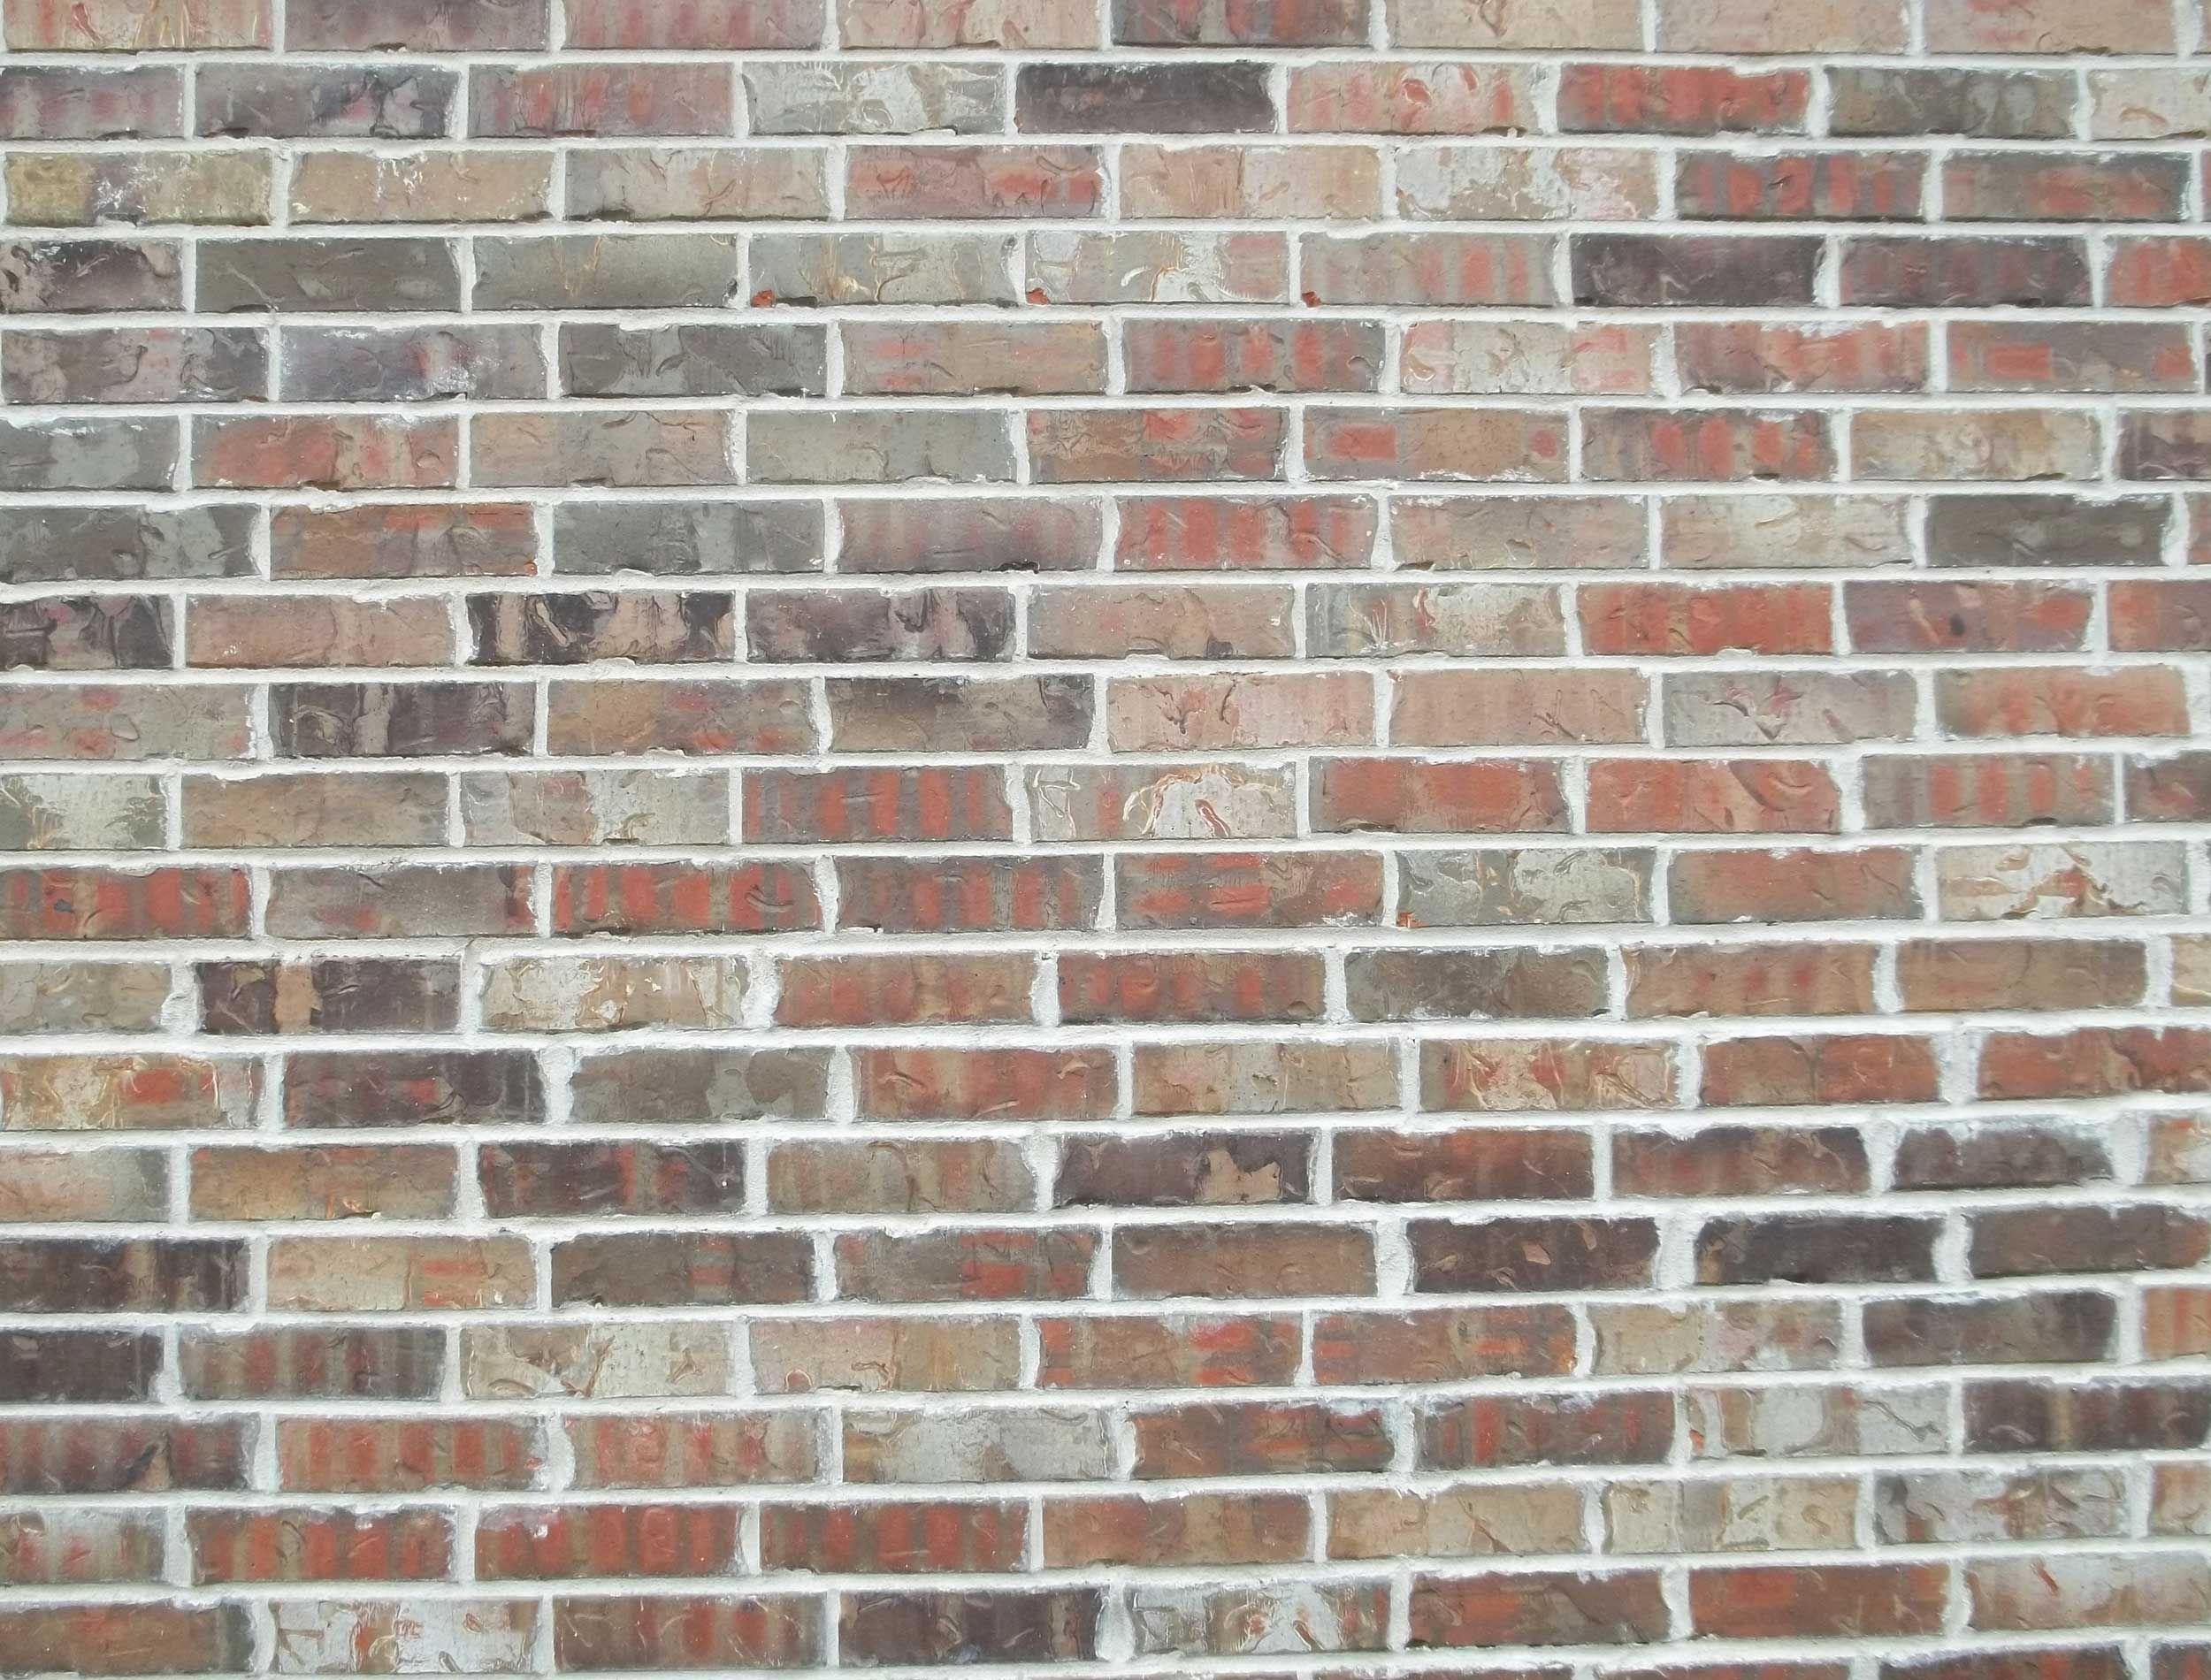 Commercial brick co covington king size brick with buff mortar commercial brick co covington king size brick with buff mortar geenschuldenfo Choice Image